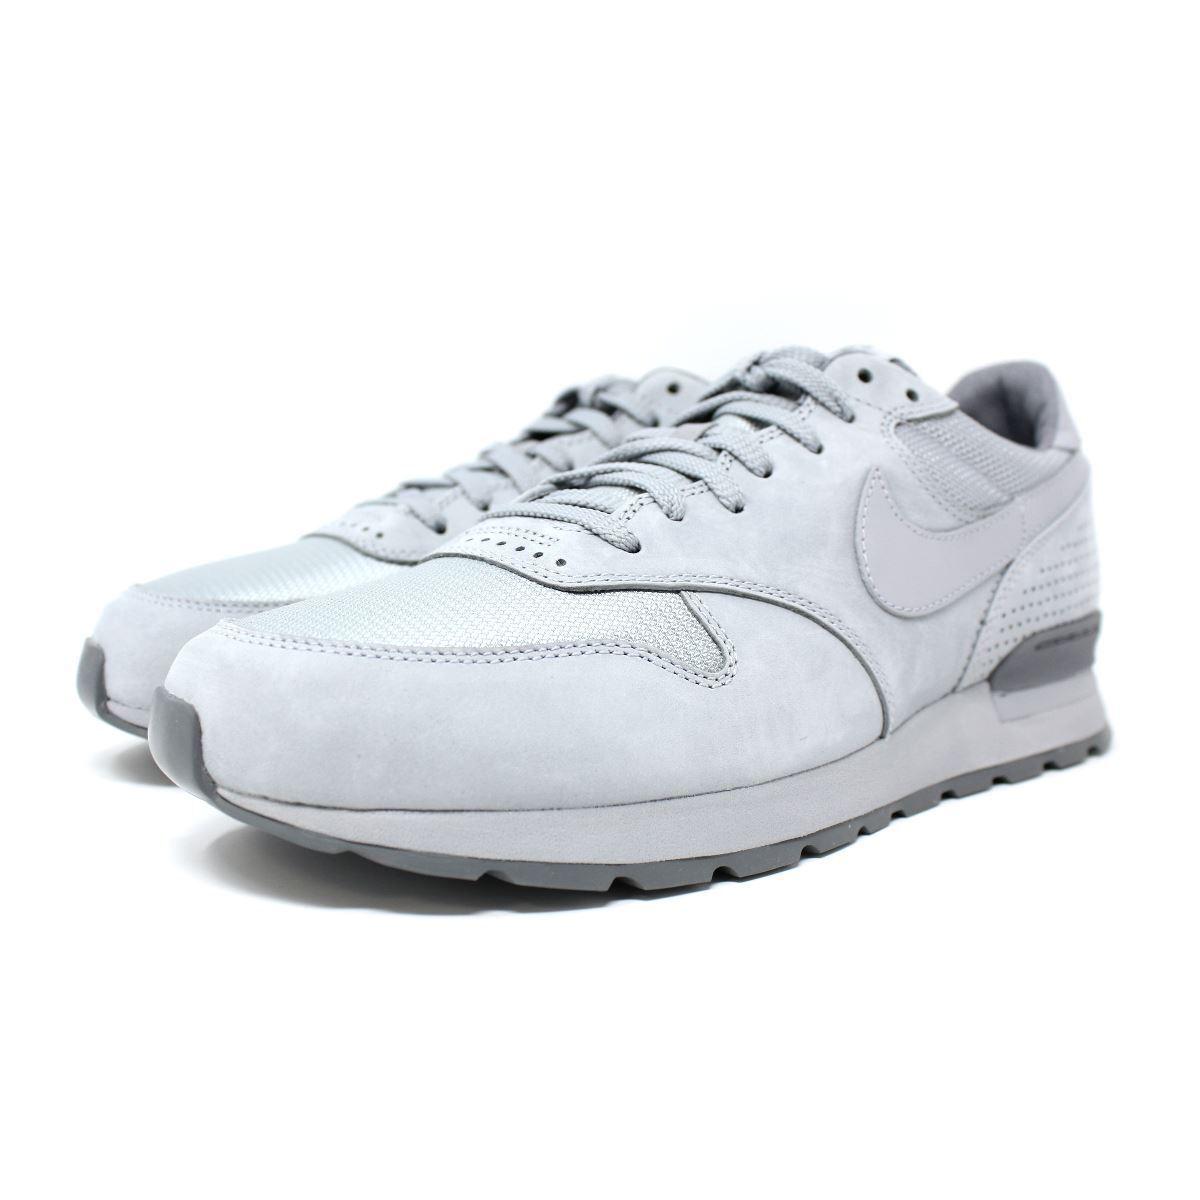 Nike Air Zoom Epic LUXE Men SZ 7.5 - 13